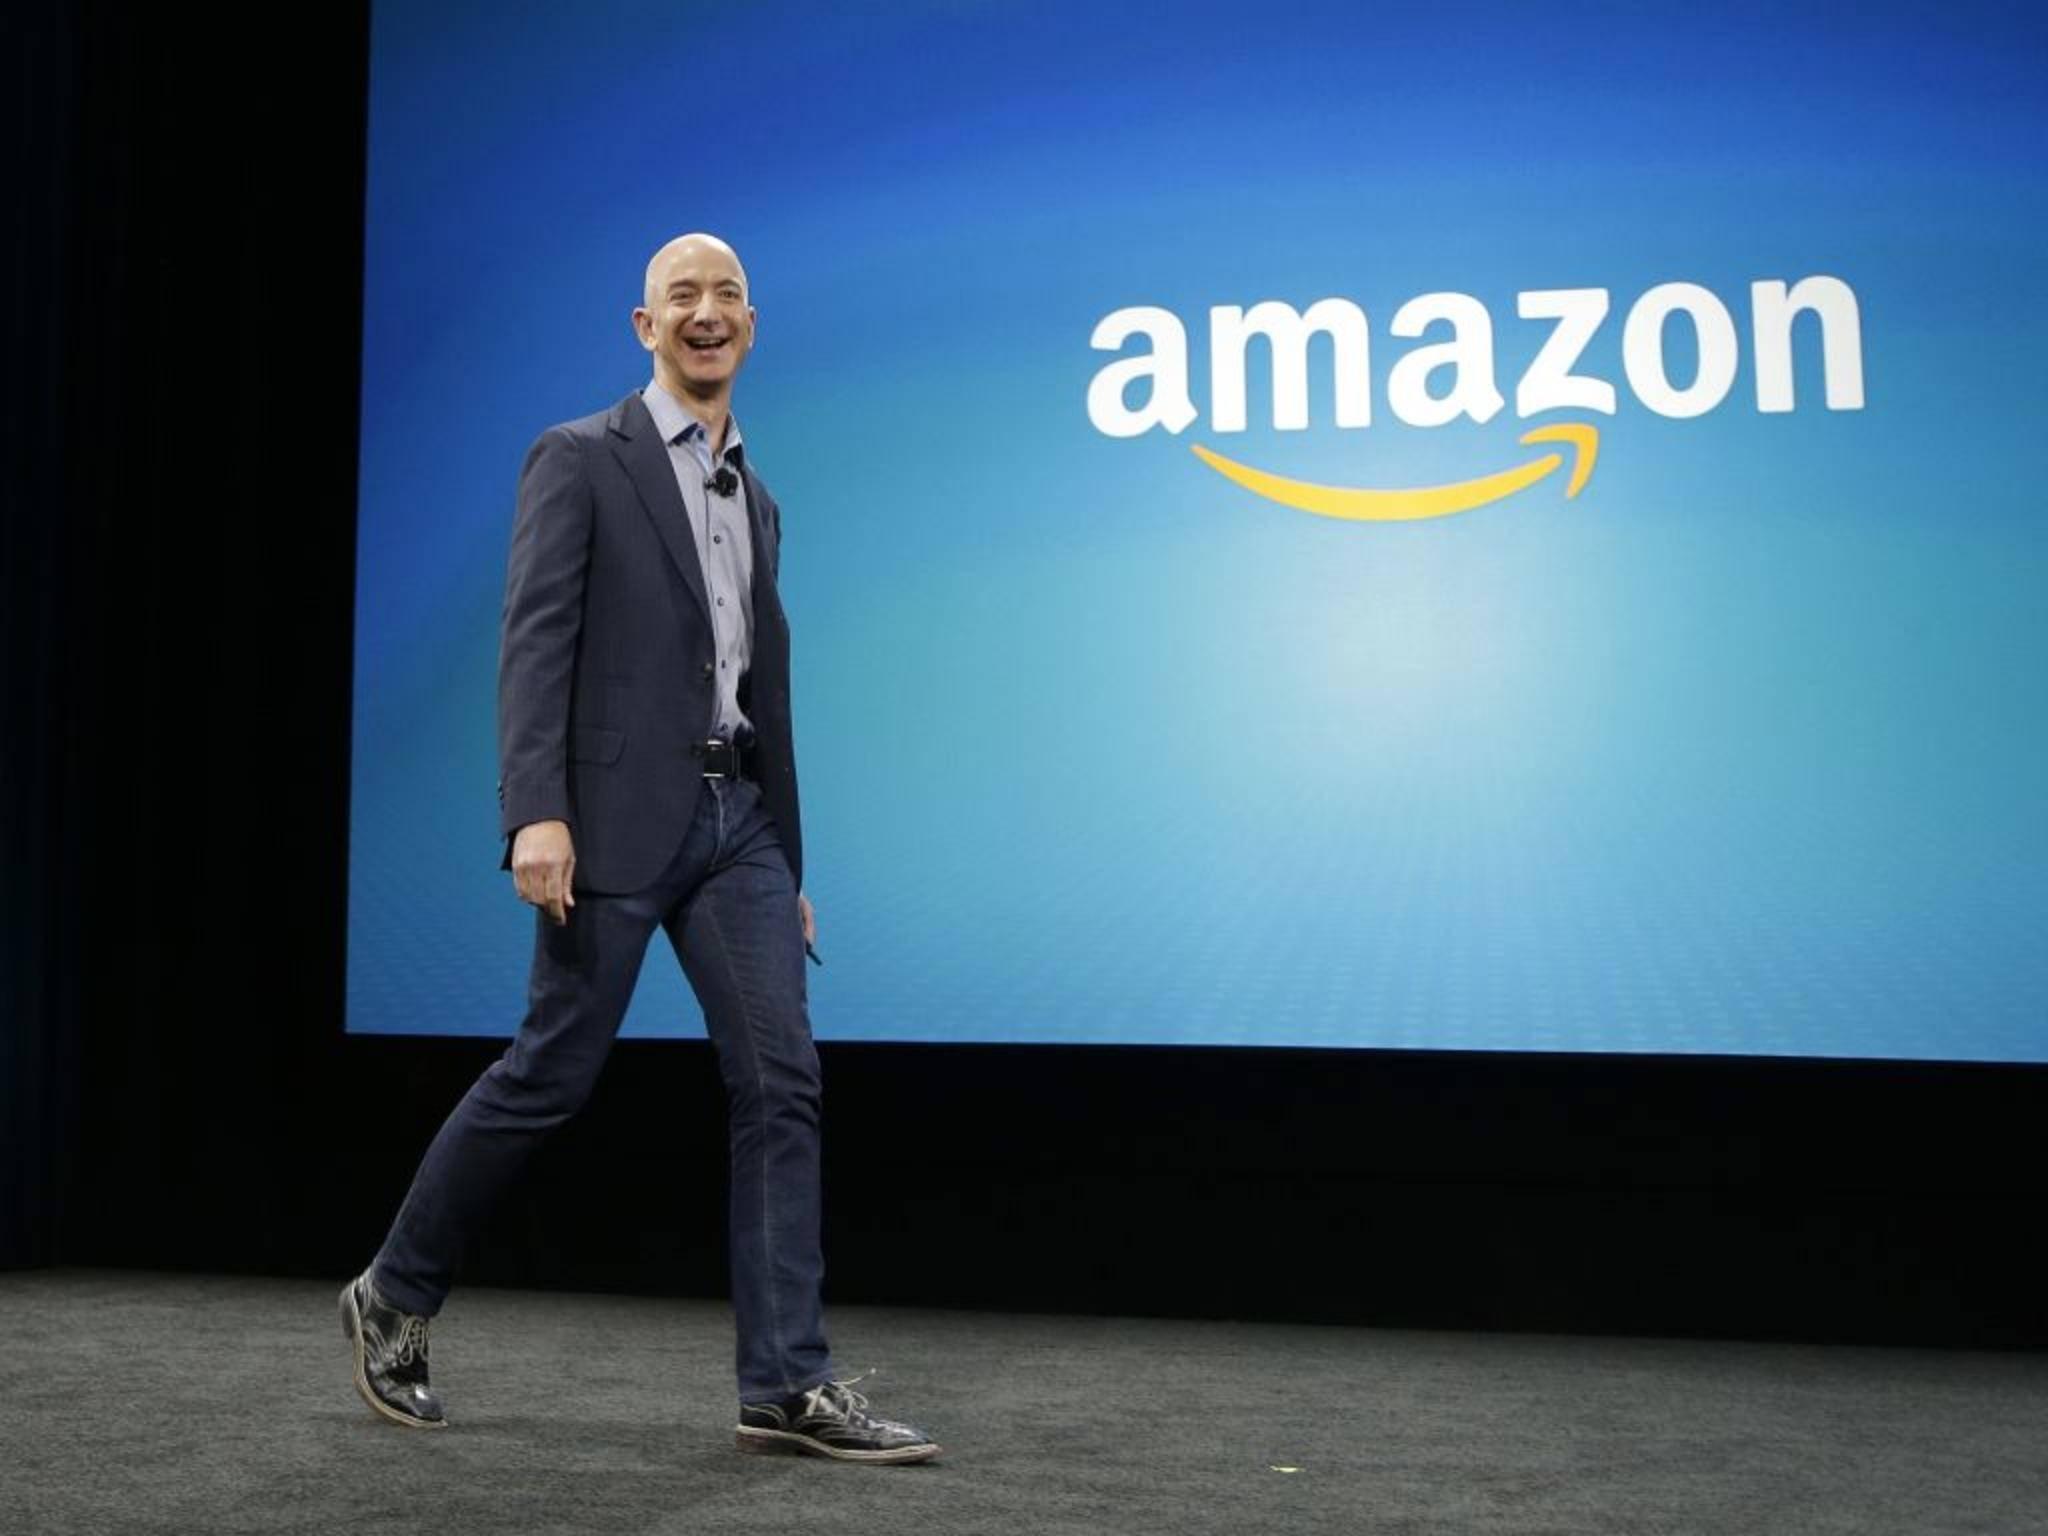 34,8 Milliarden Dollar: Amazons CEO Jeff Bezos liegt auf Rang 3.